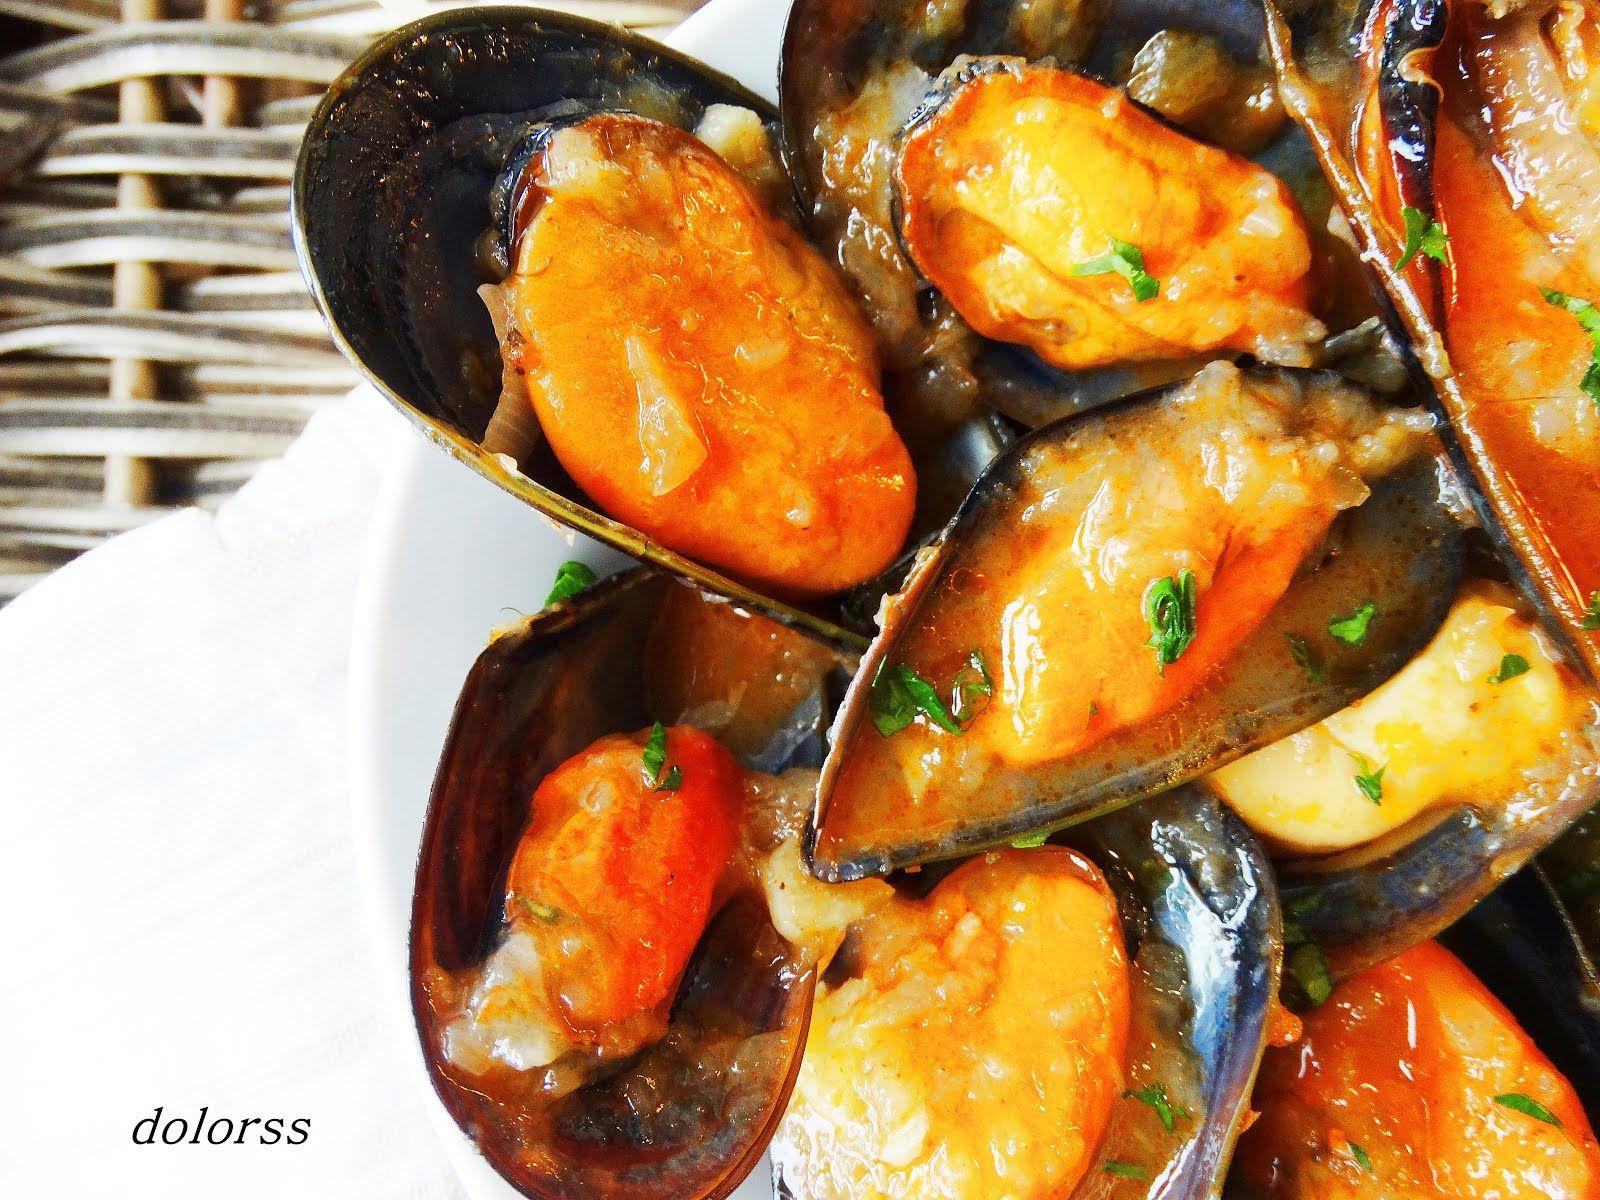 Recetas Cocina Blog   Blog De Cocina Recetas Sencillas Platos Faciles Cocina Pactica De